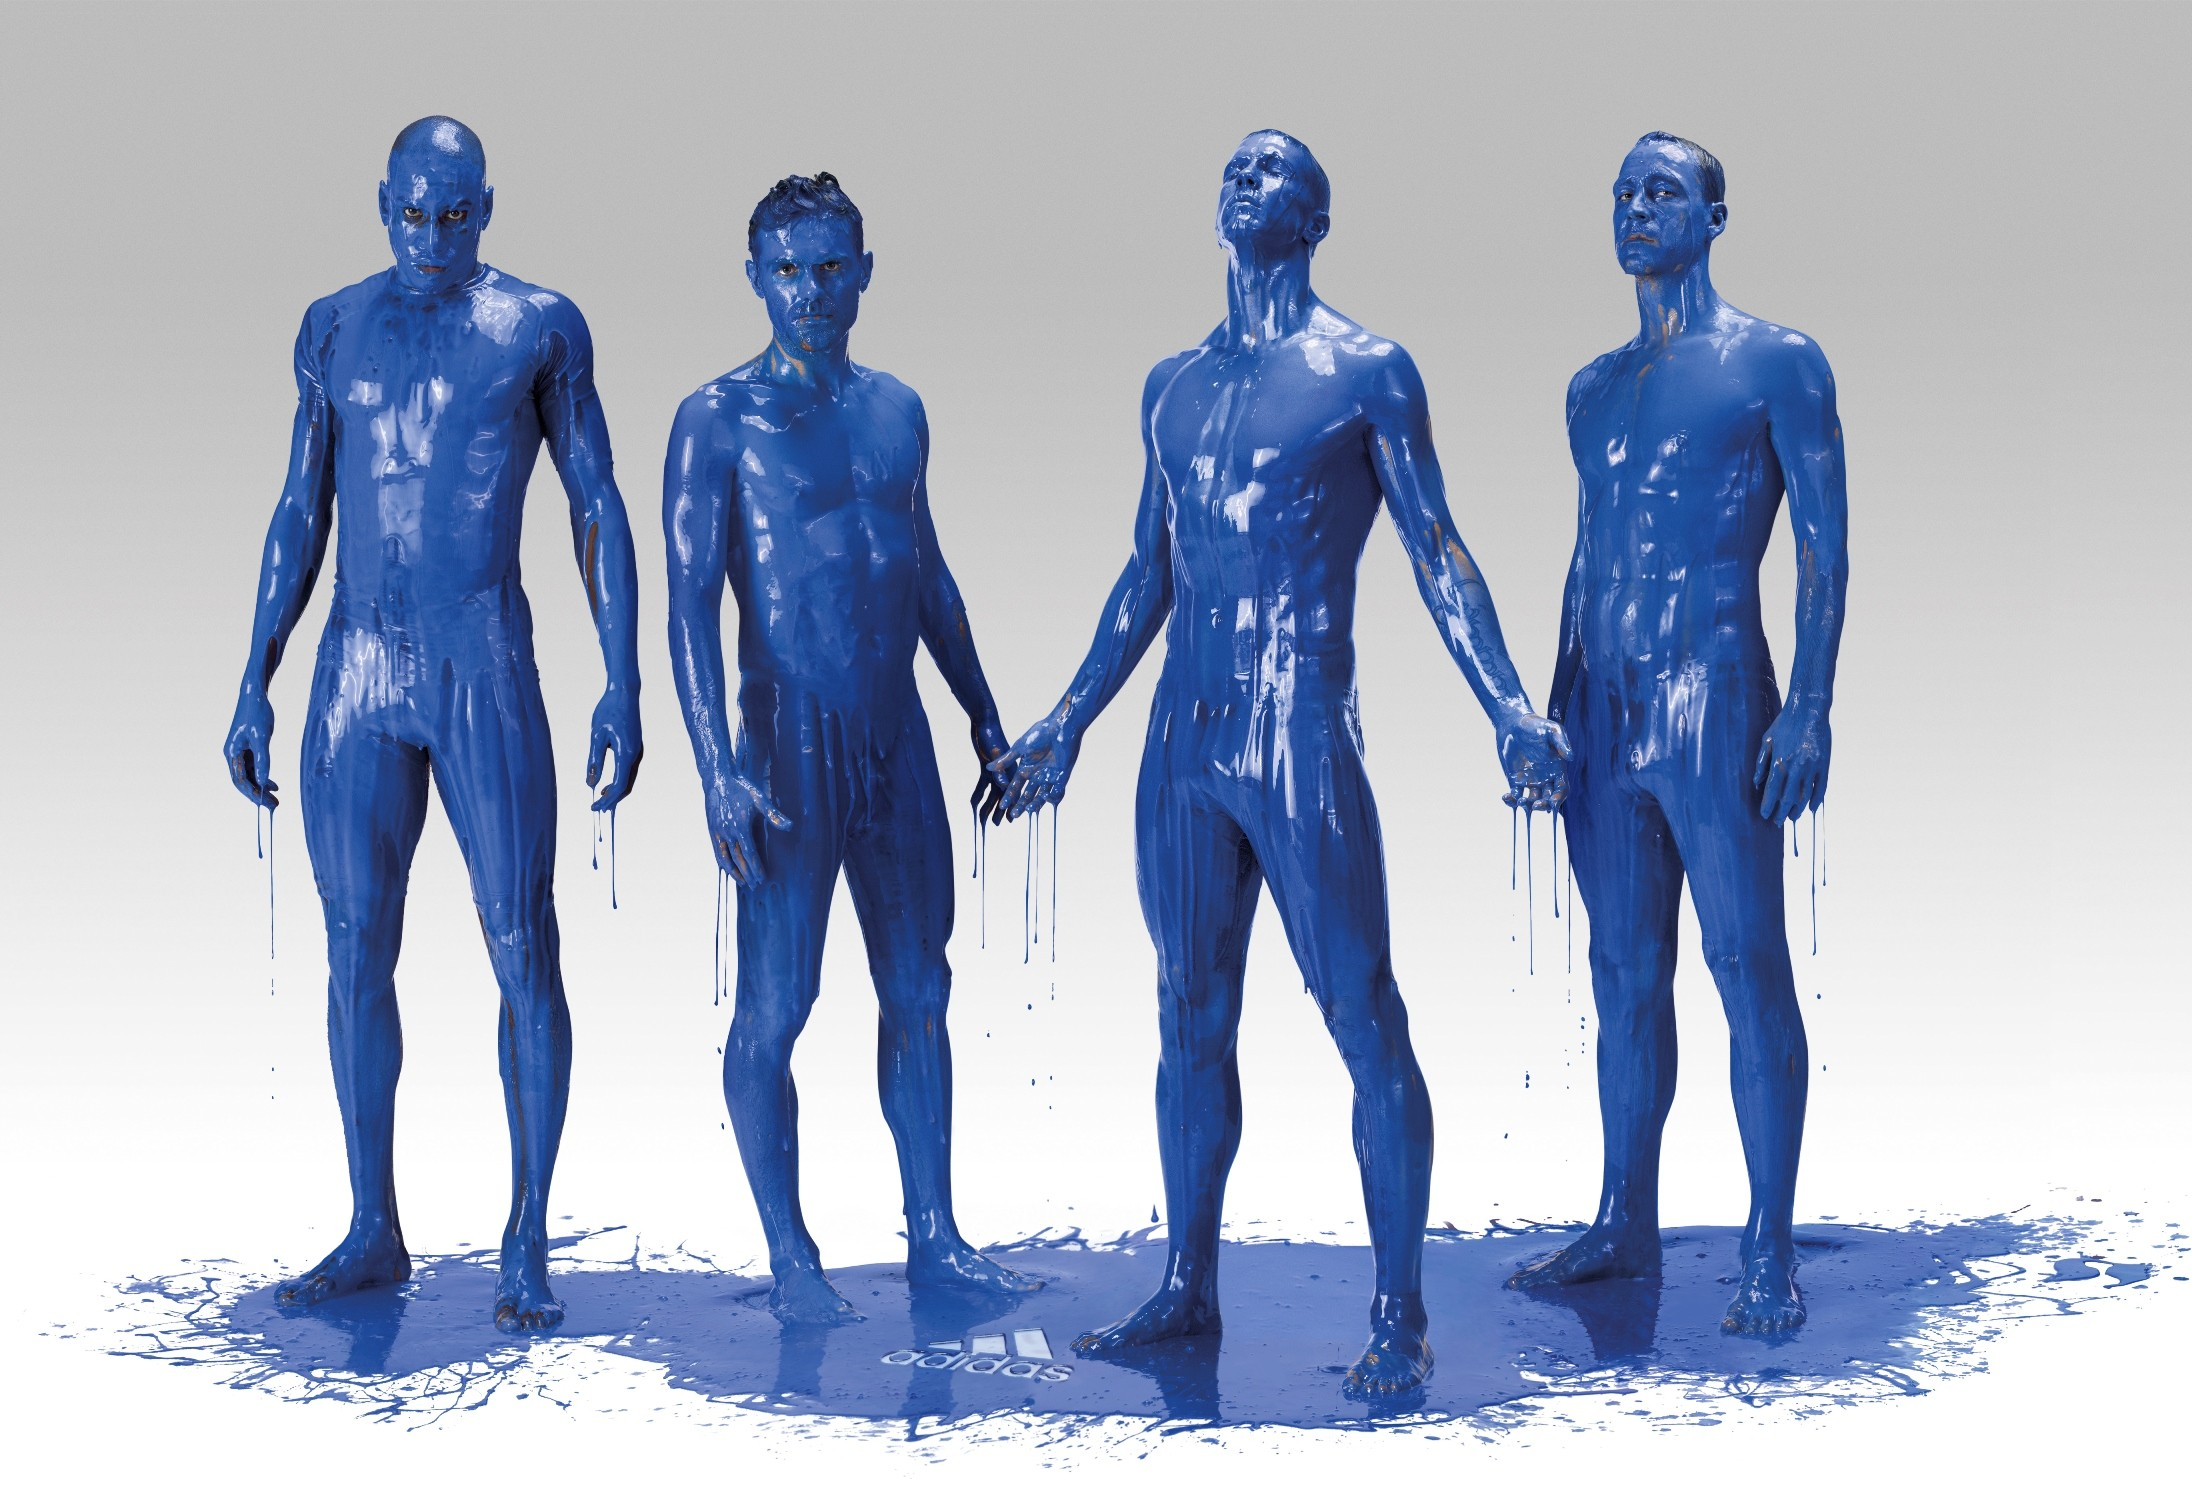 Adidas. It's Blue, What else matters